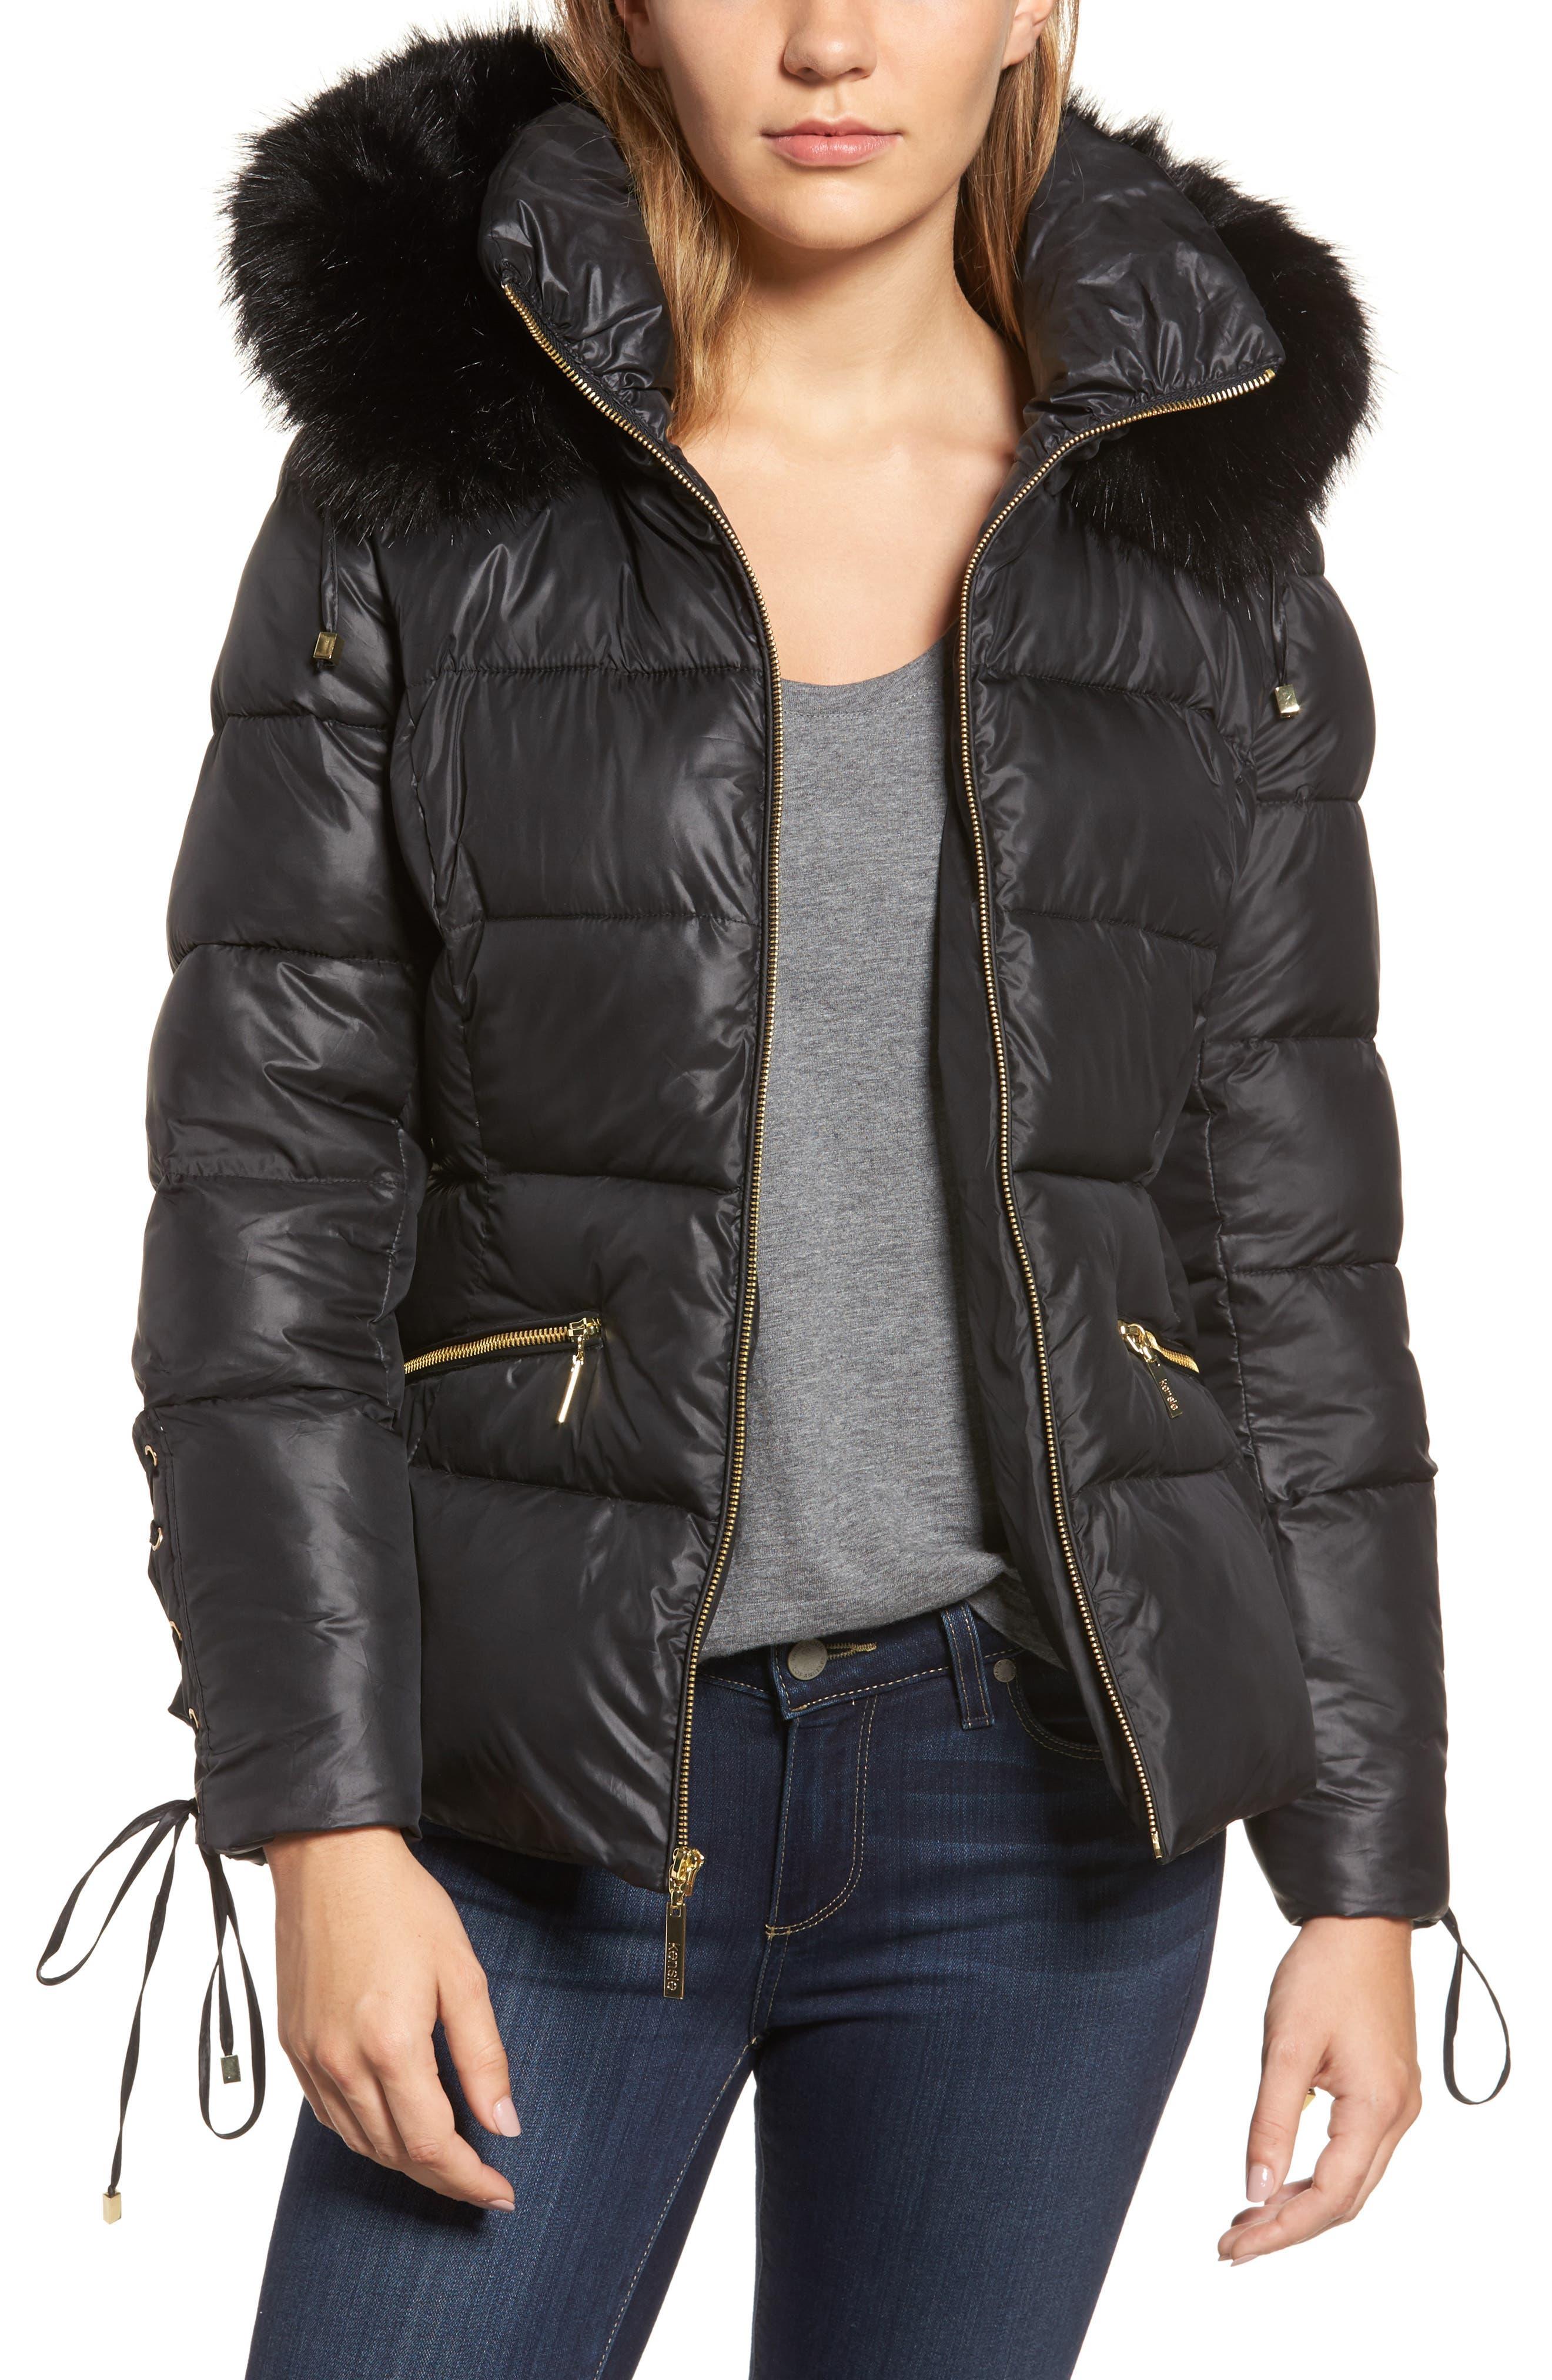 Alternate Image 1 Selected - kensie Lace Sleeve Puffer Coat with Faux Fur Trim Hood